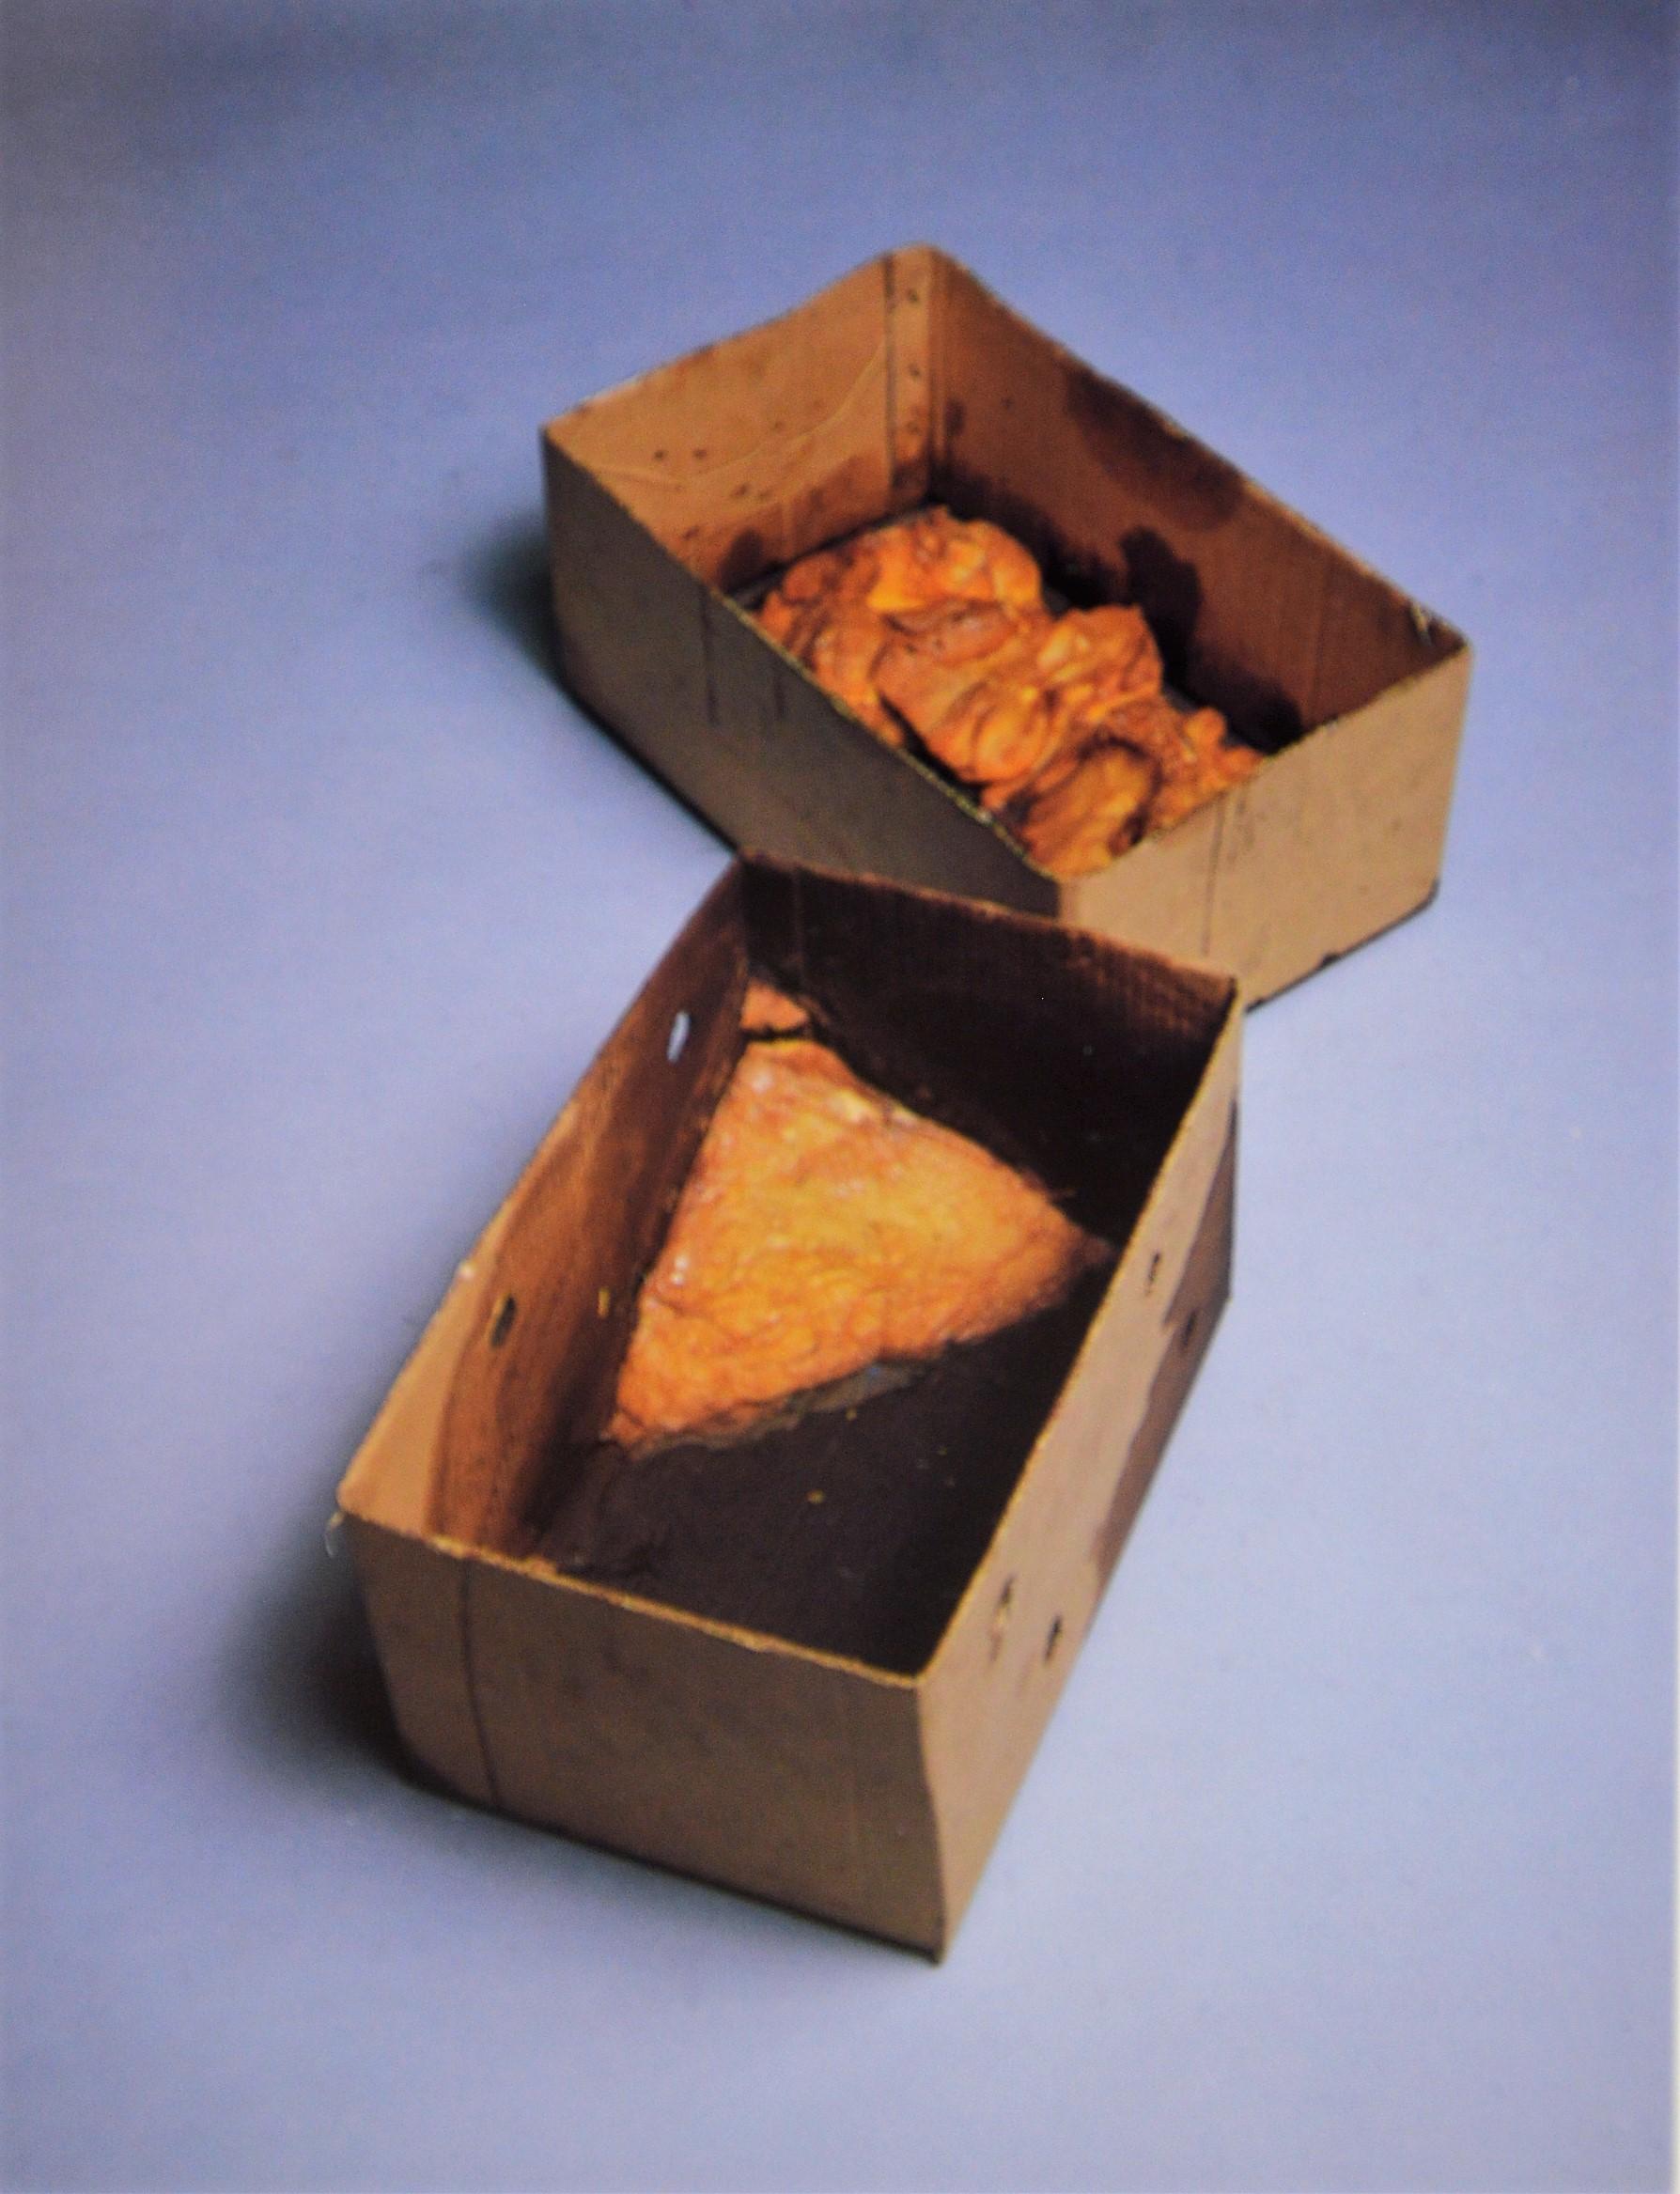 Joseph Beuys. Fat Corner Preocess, 1968.